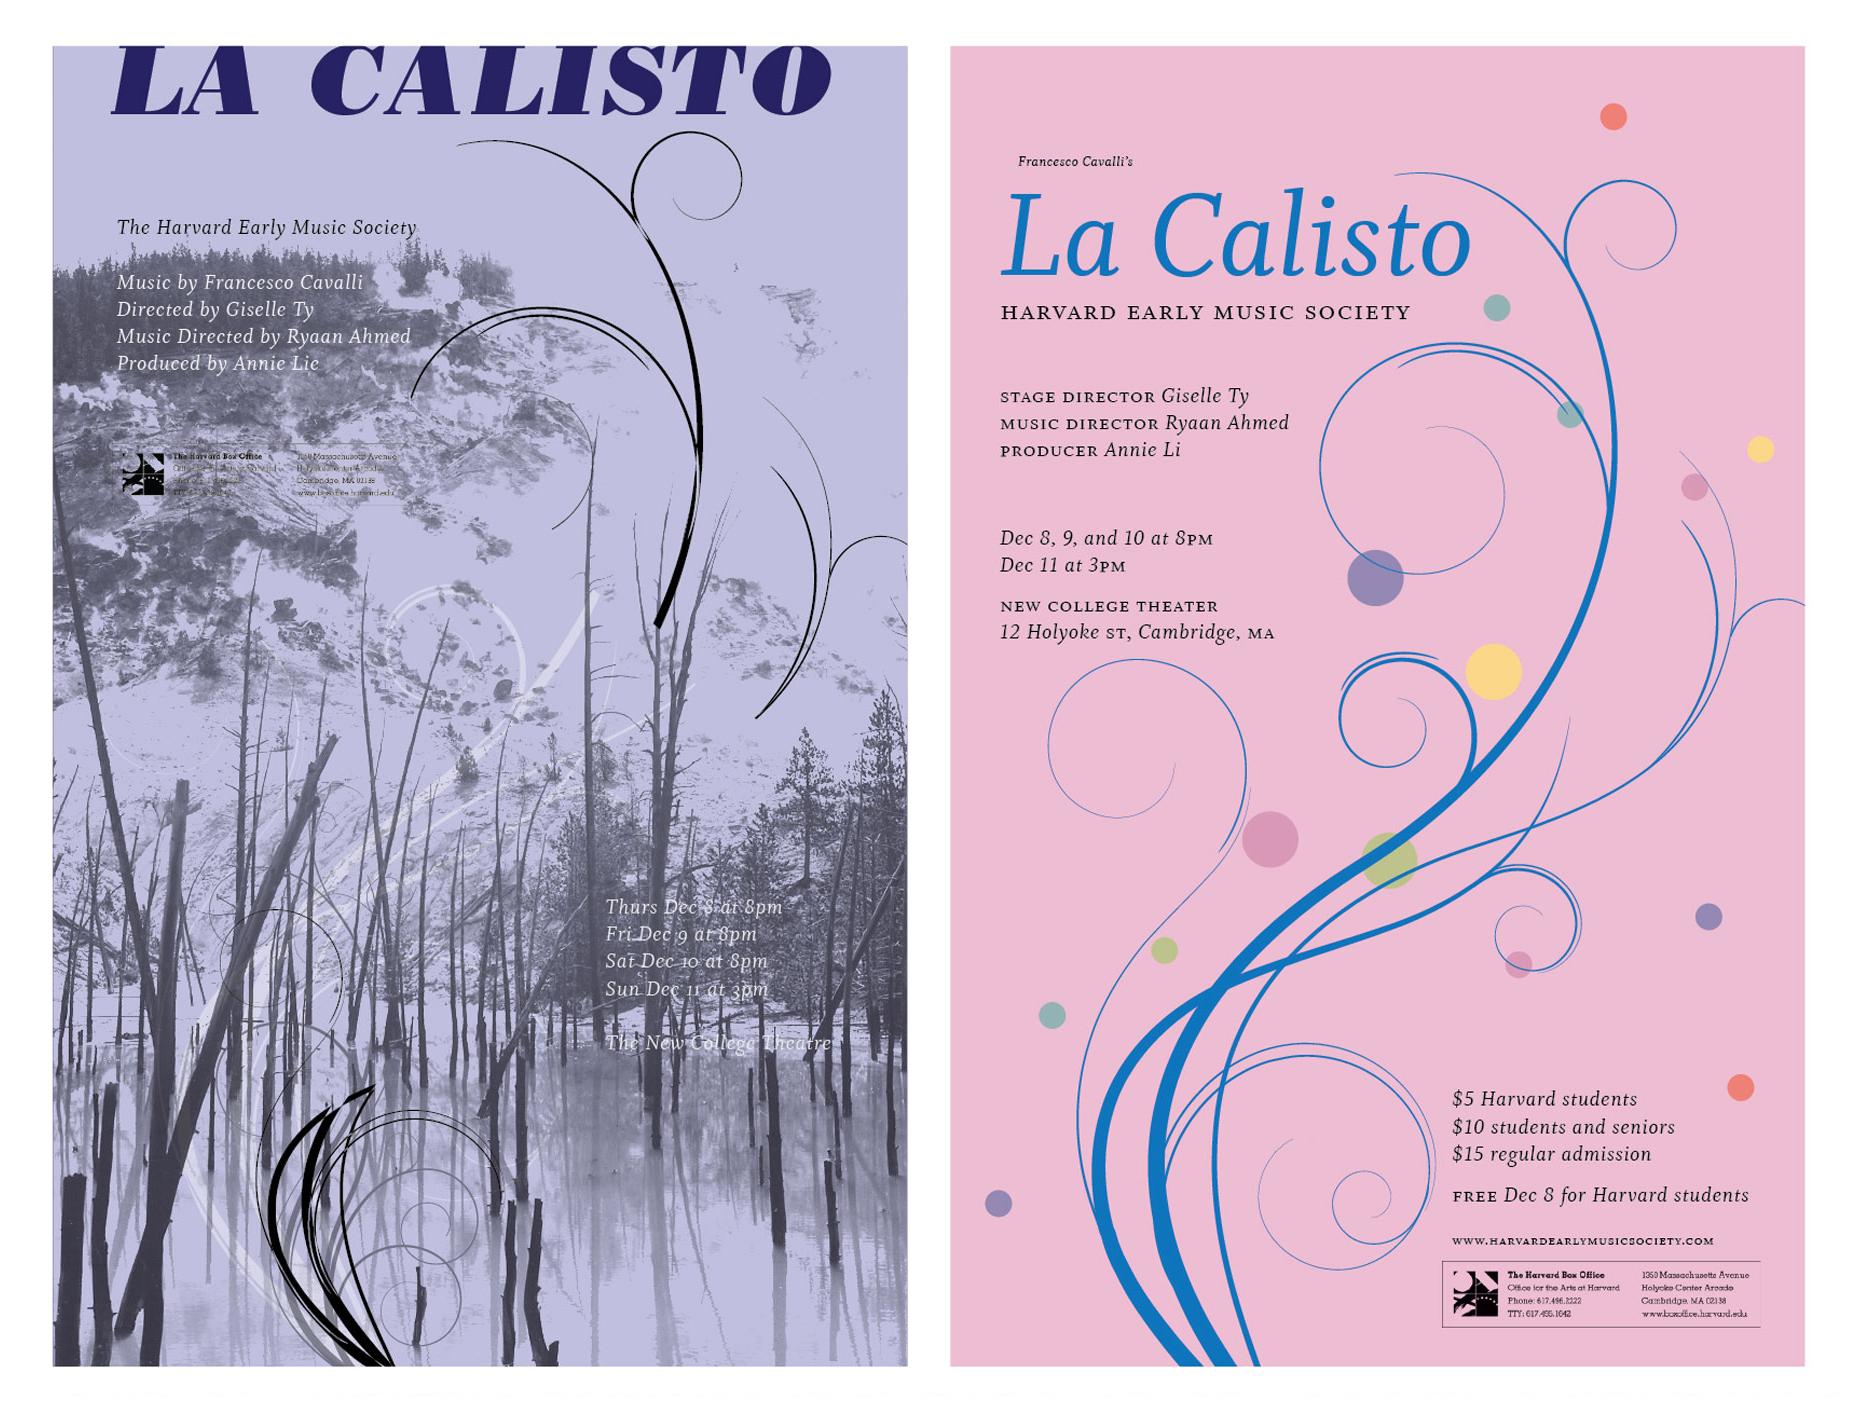 calisto-posters04@2x